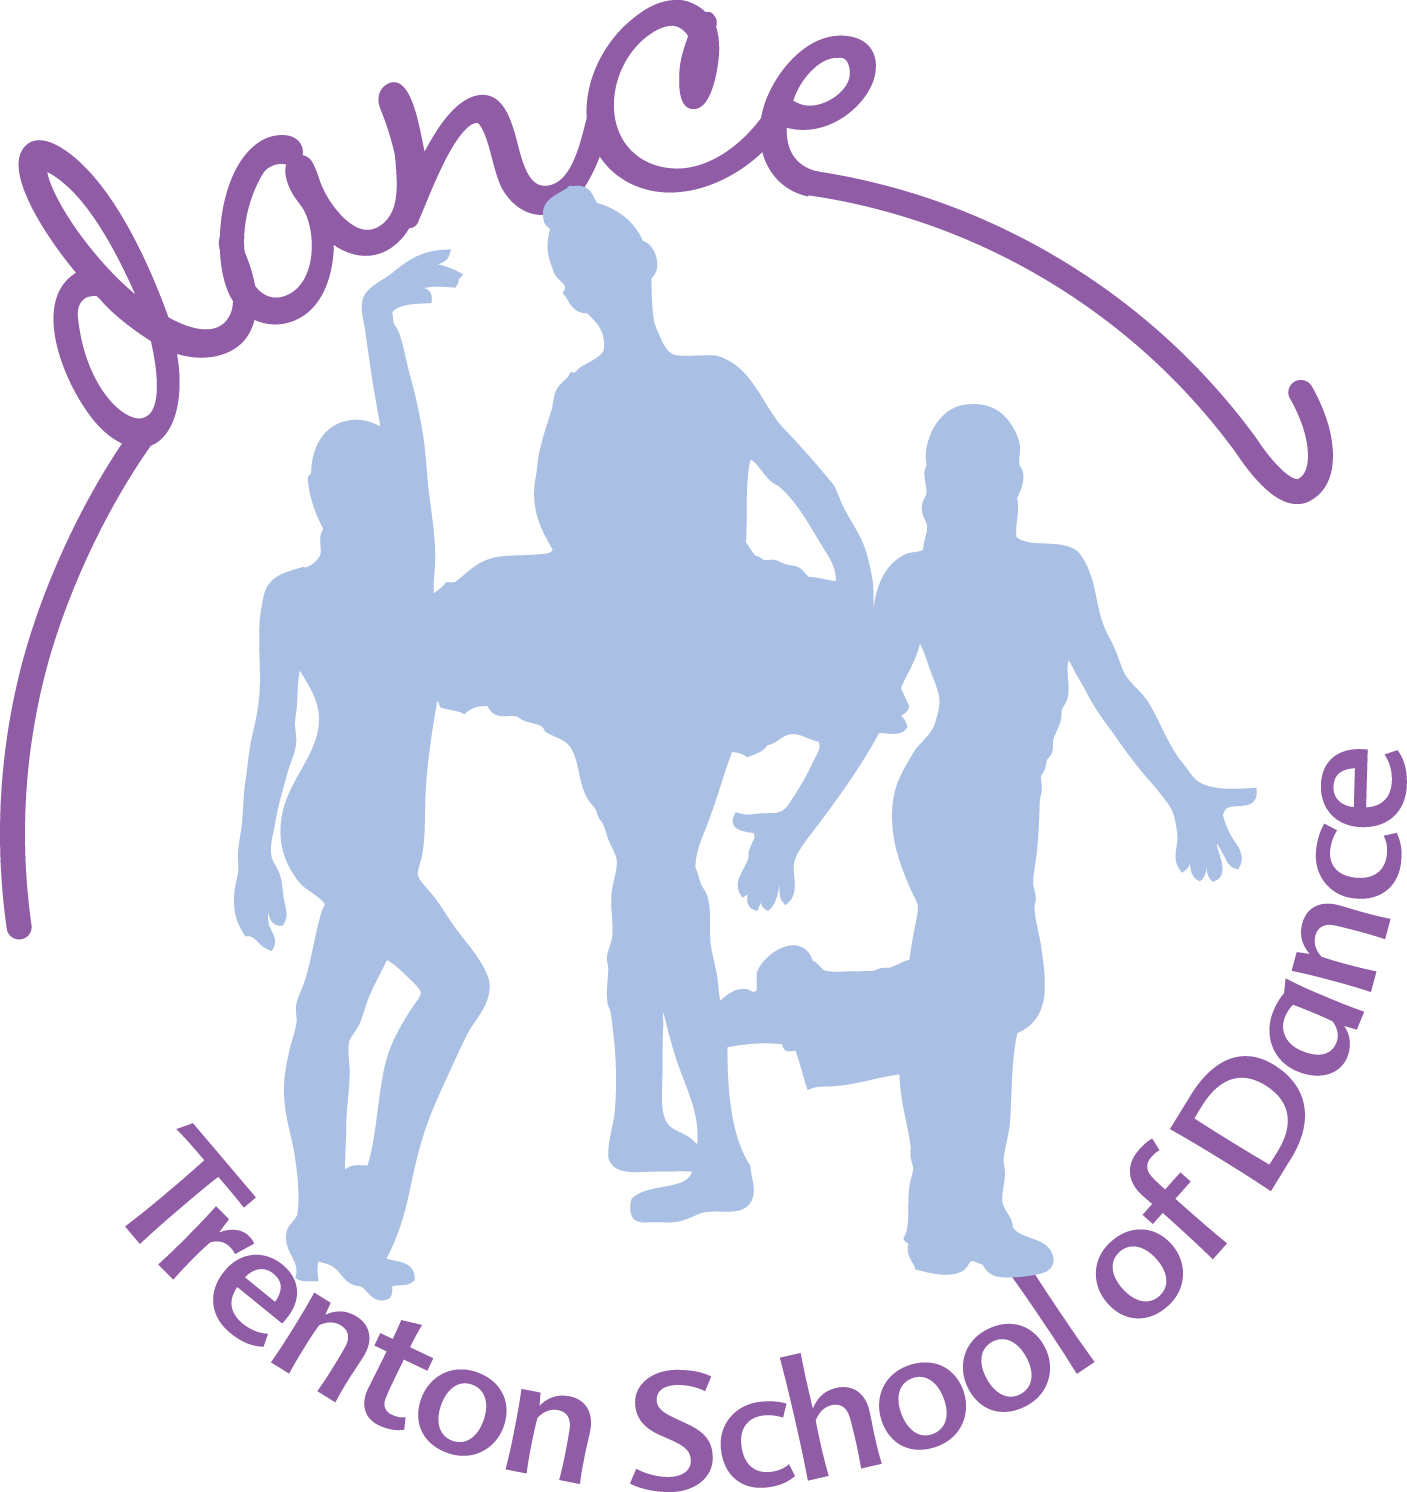 Dance clipart school dance. Trenton of premier downriver